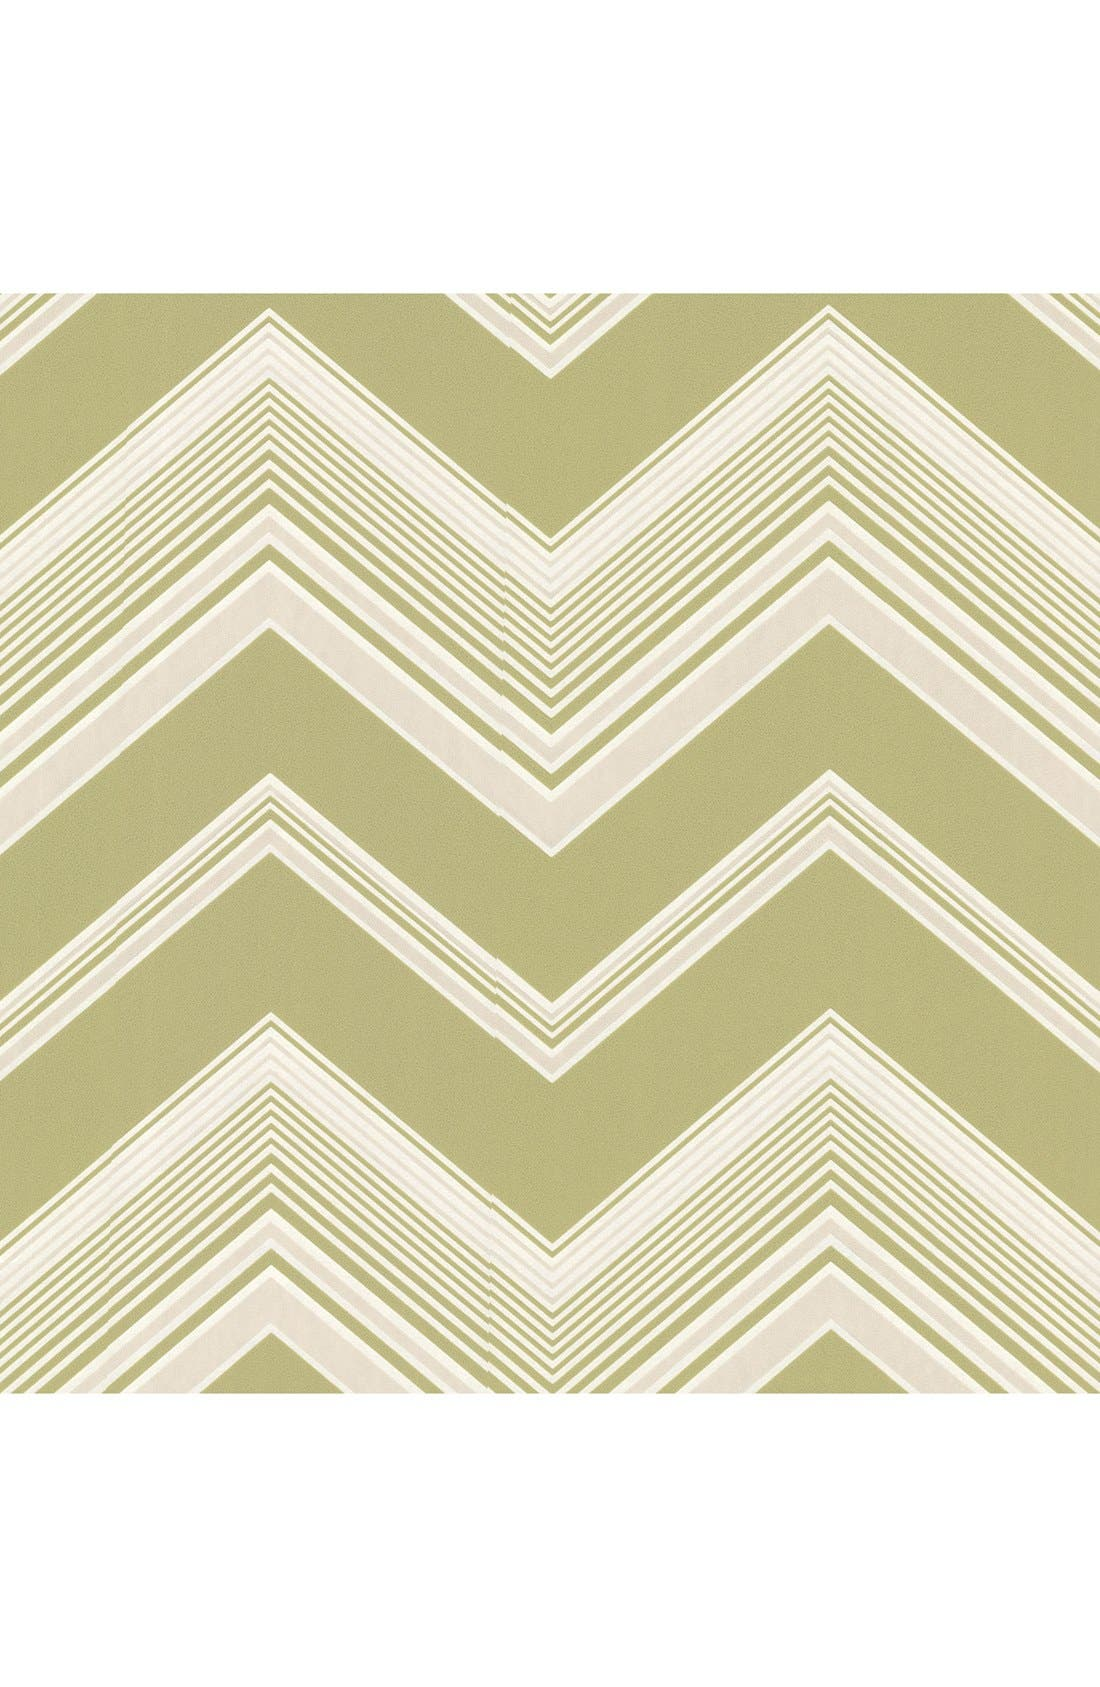 'Bearden Light - Zigzag' Unpasted Wallpaper,                             Alternate thumbnail 2, color,                             300